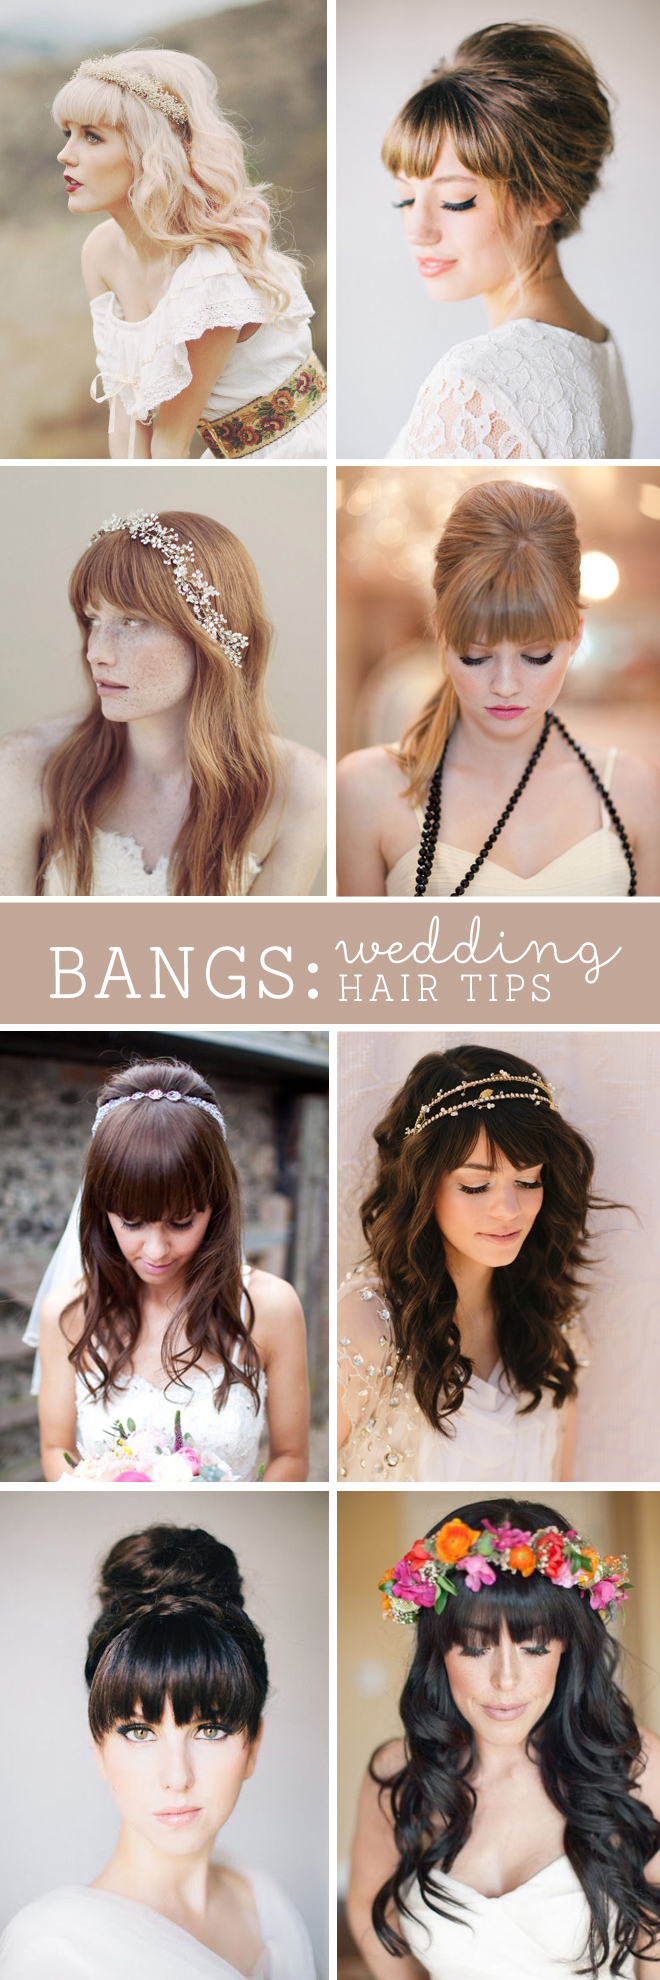 Awe Inspiring Must Read Tips For Wedding Hairstyles With Full Fringe Bangs Short Hairstyles Gunalazisus